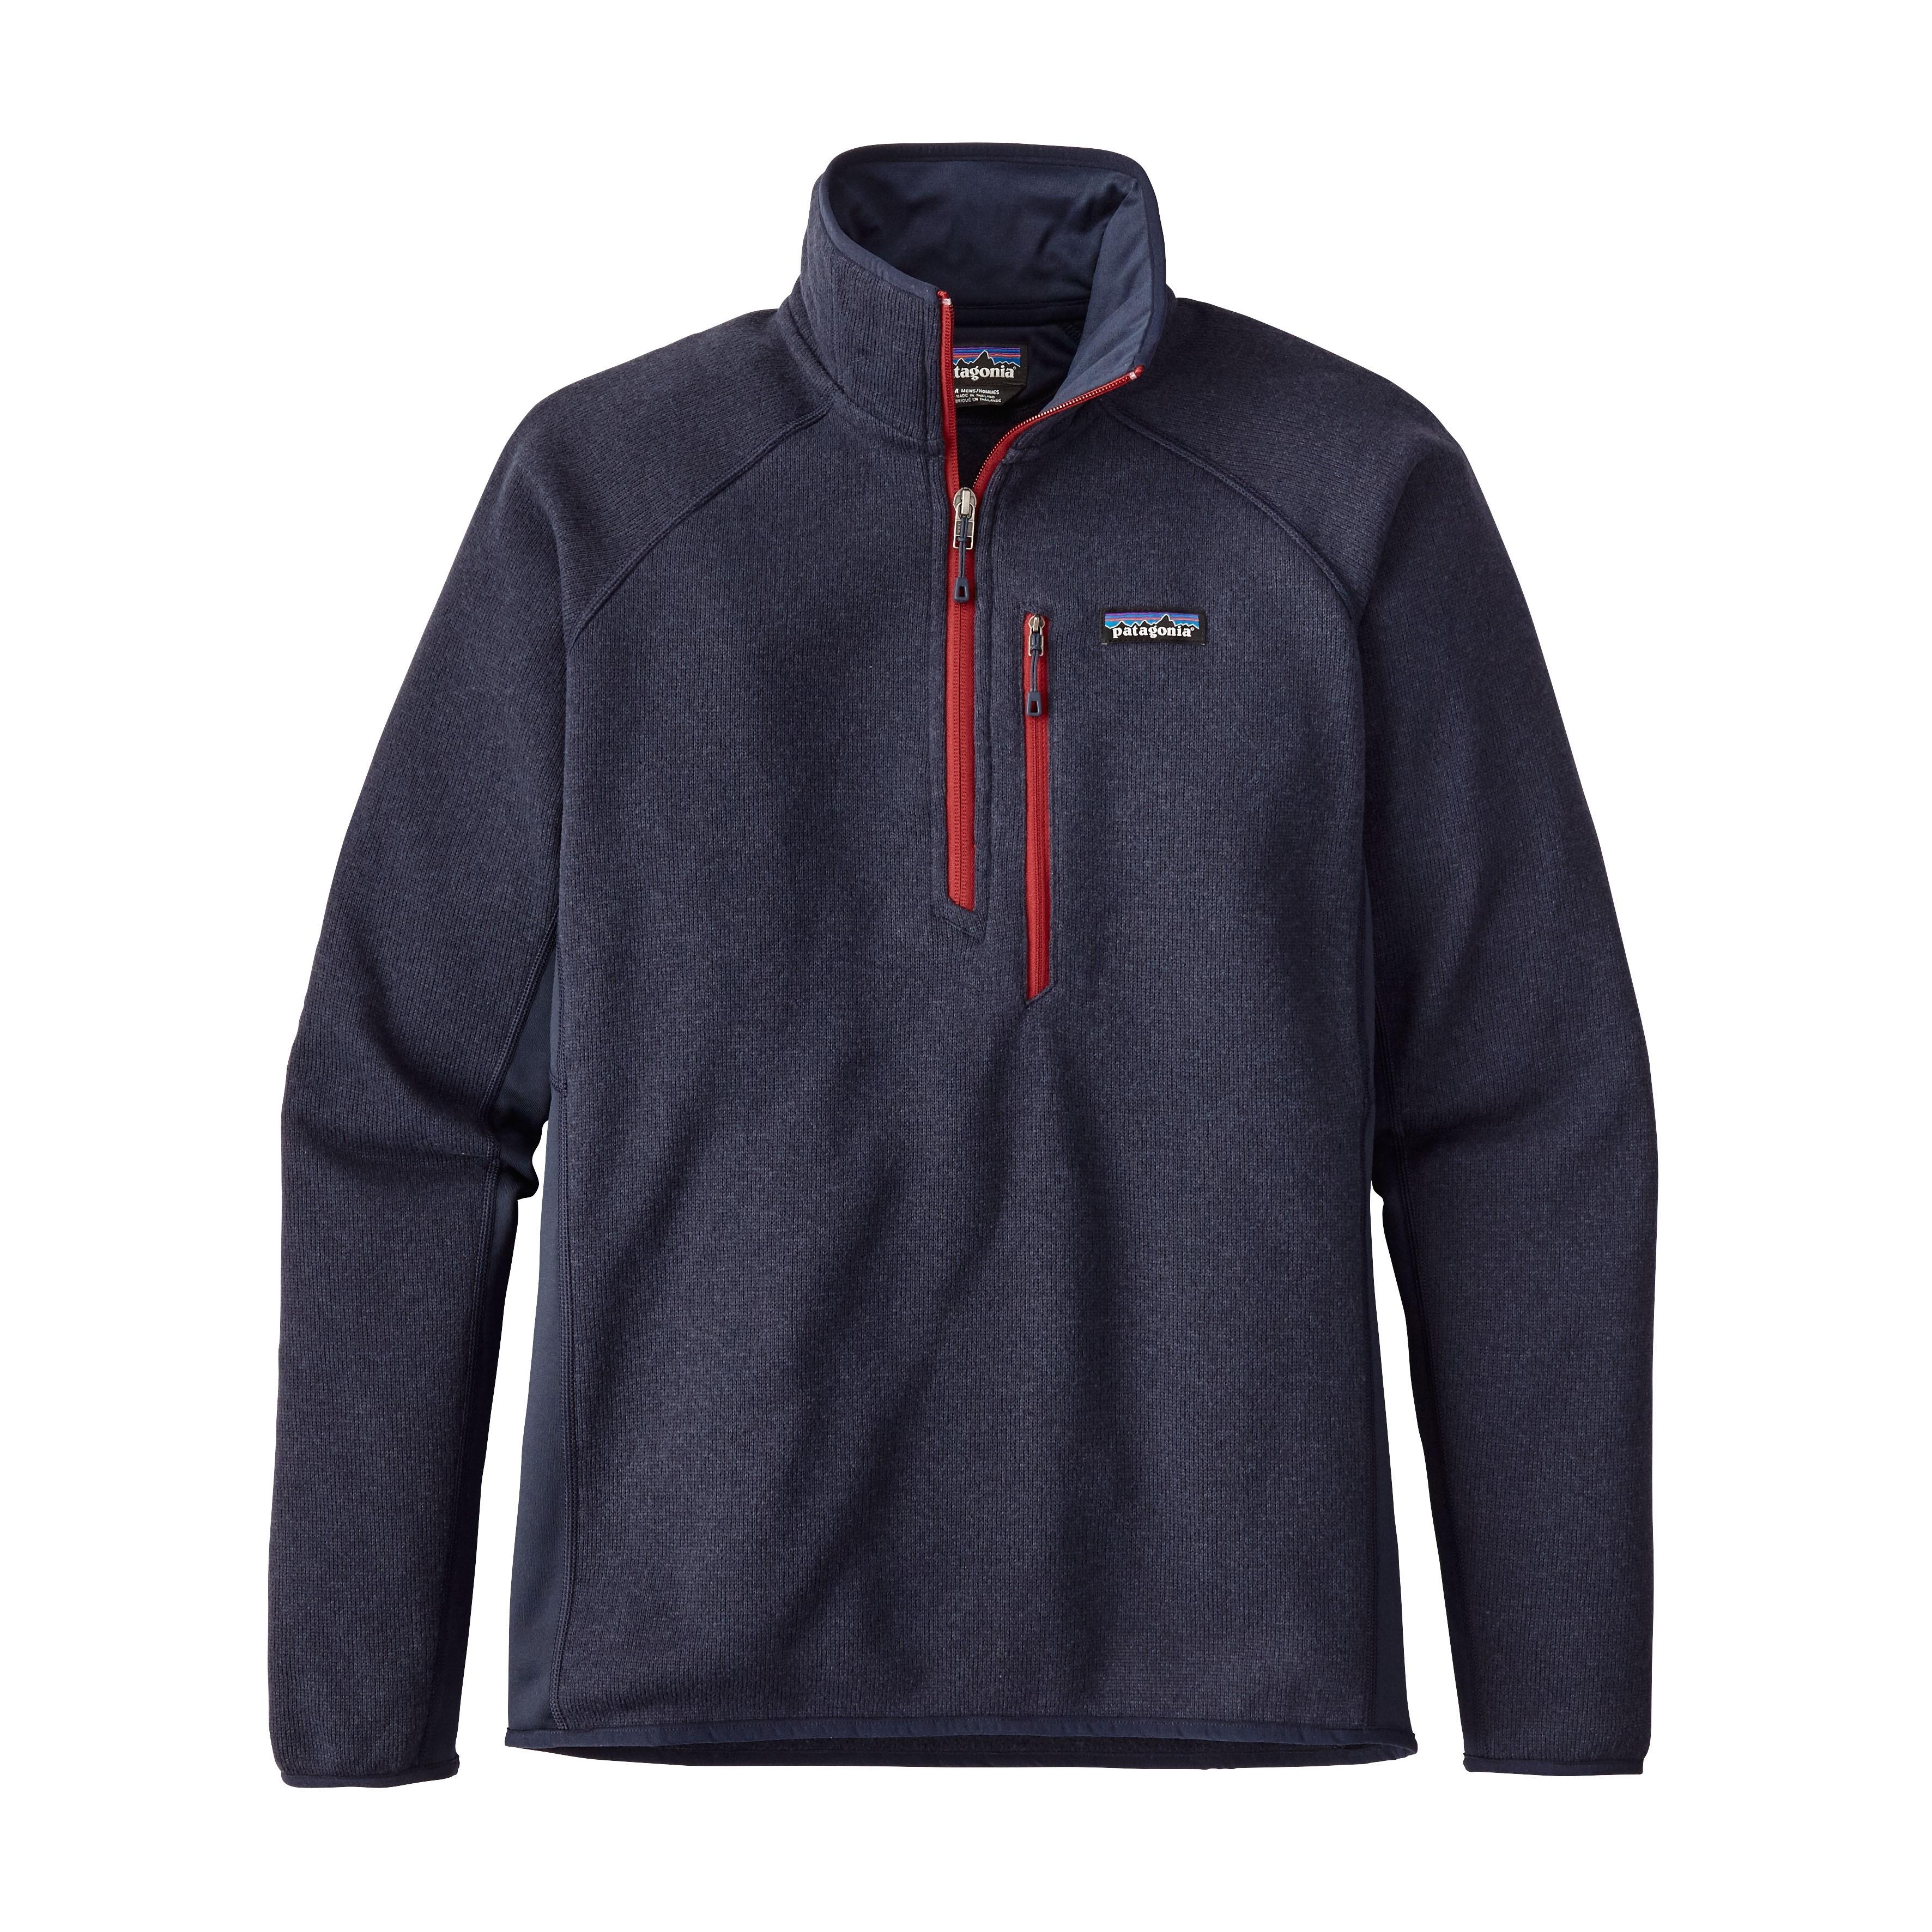 Patagonia Performance Better Sweater™ Fleece 1/4-Zip : Navy Blue